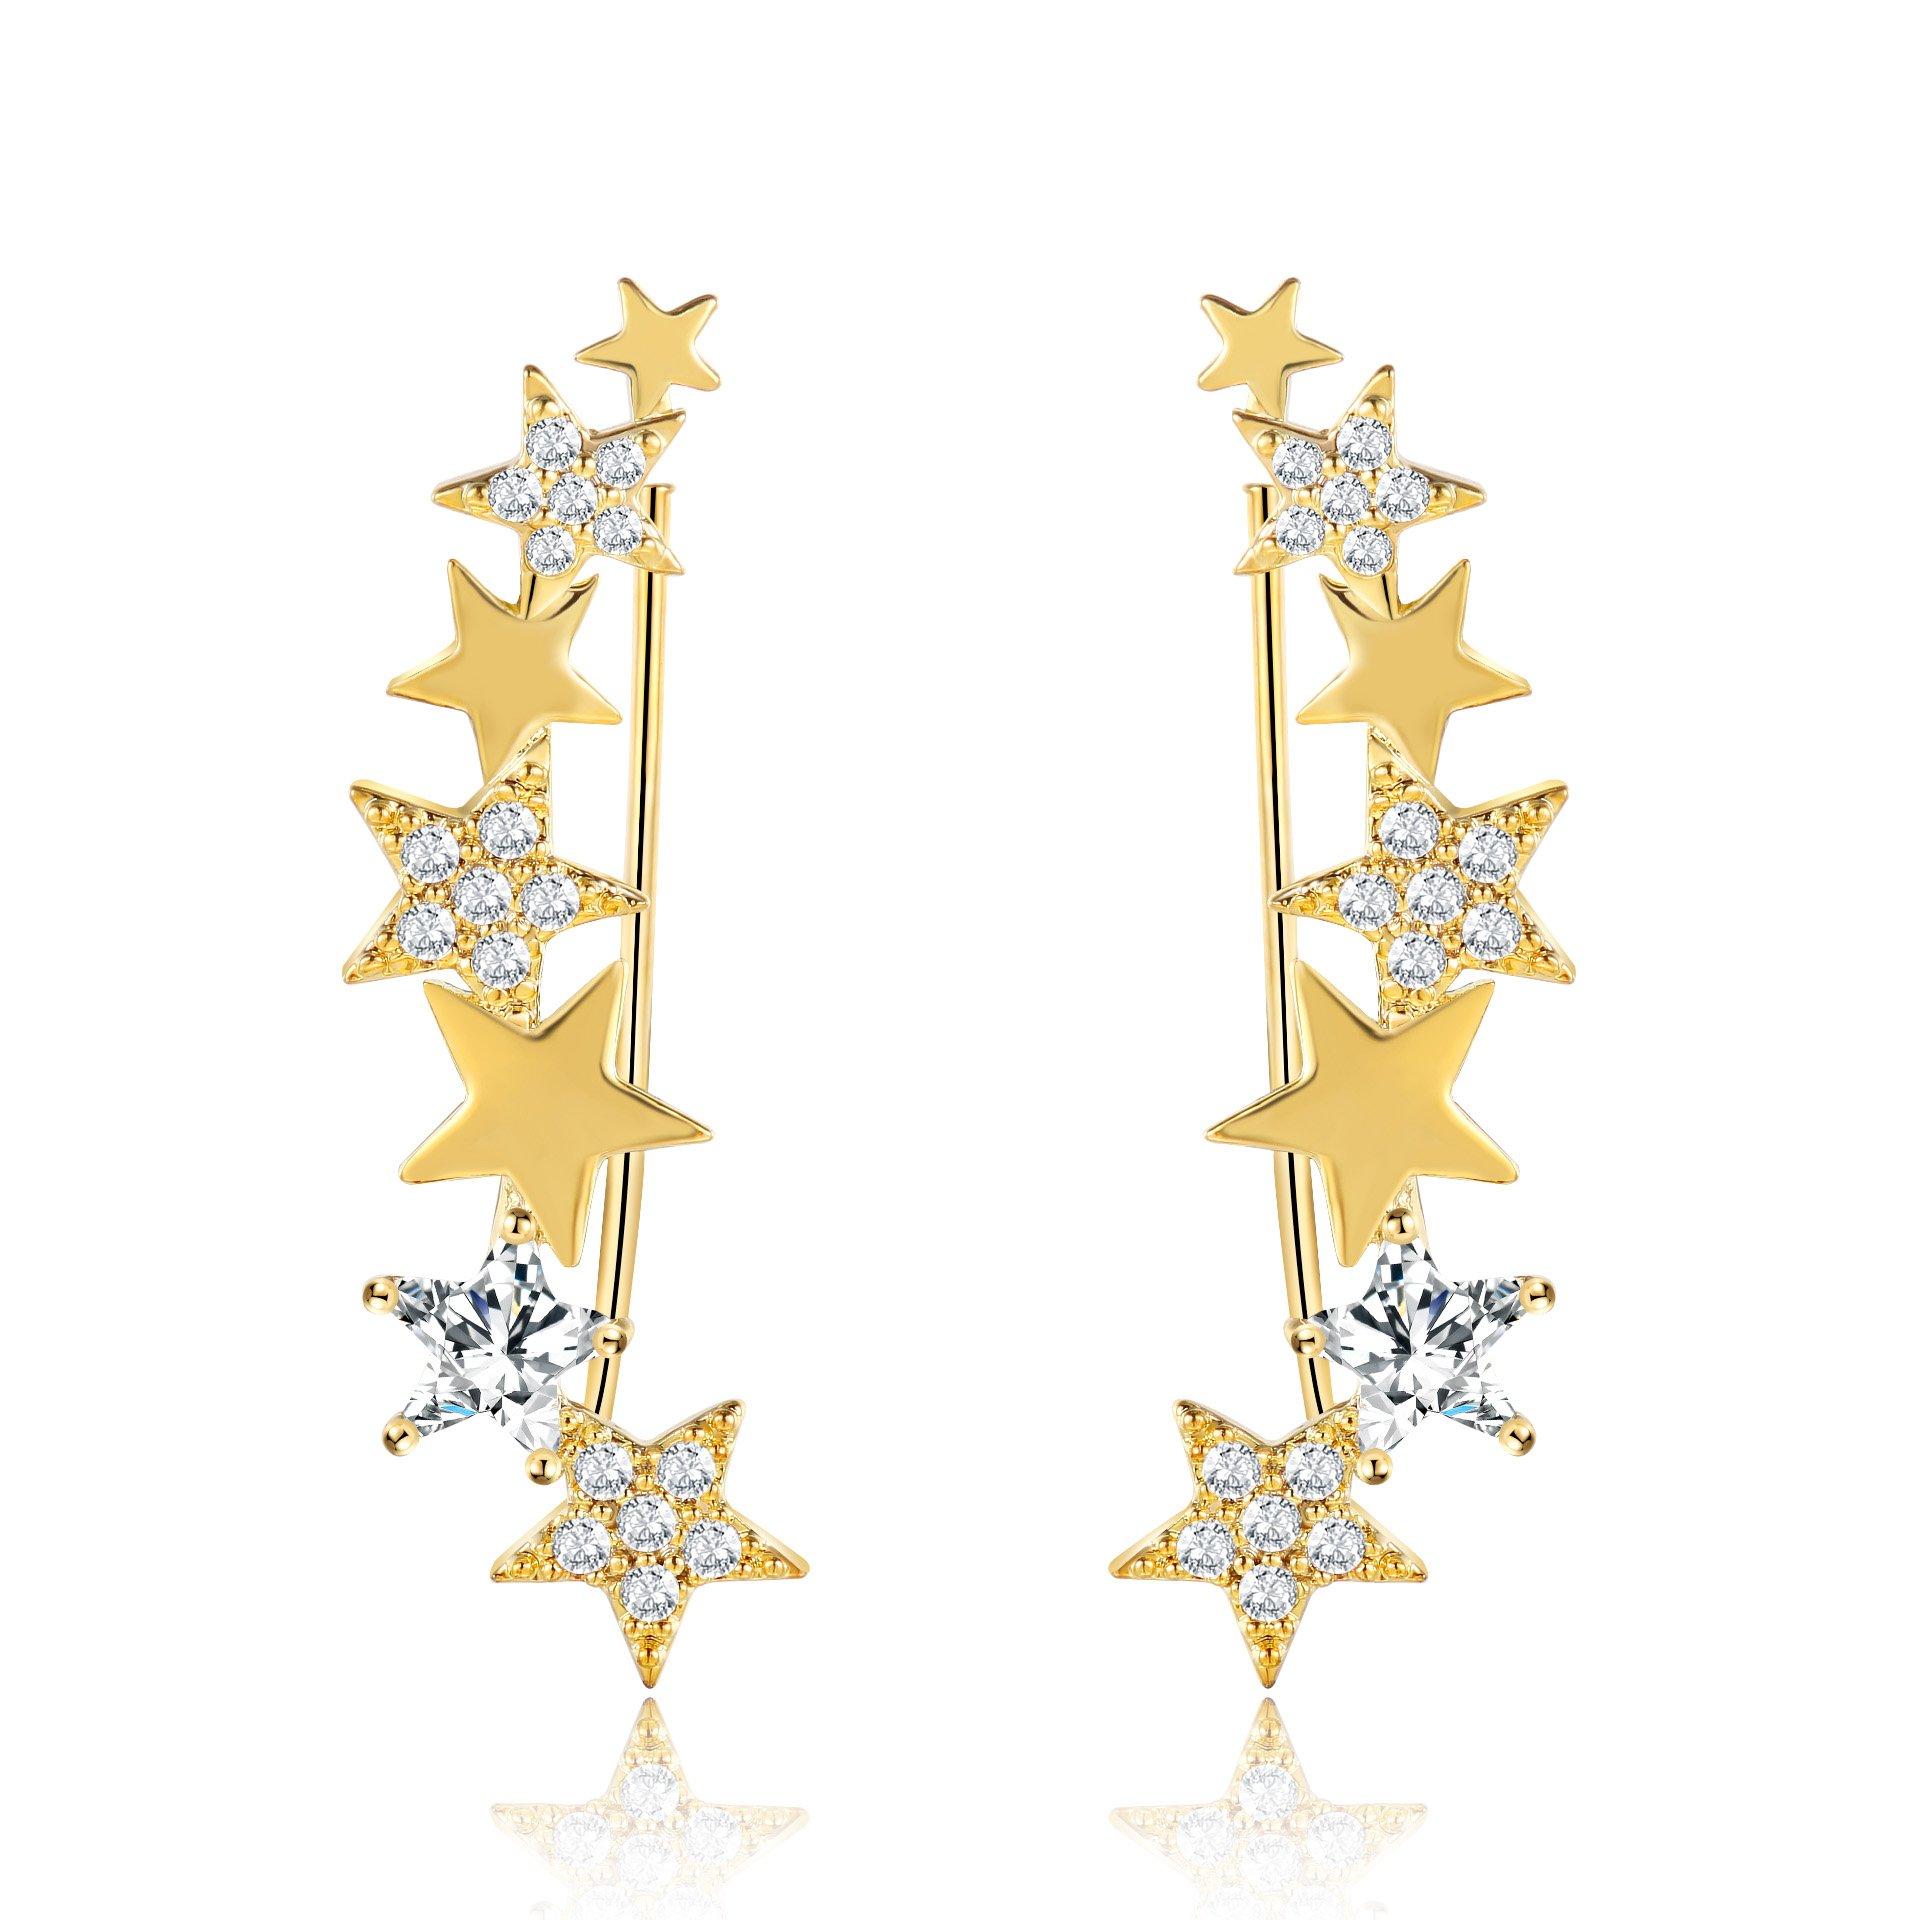 Mevecco Womens Girls Ear Crawler Climber Star CZ Crystal Ear Wrap Cuffs Earrings Sweep Stud Earring Pin Jewelry-Star4-GD